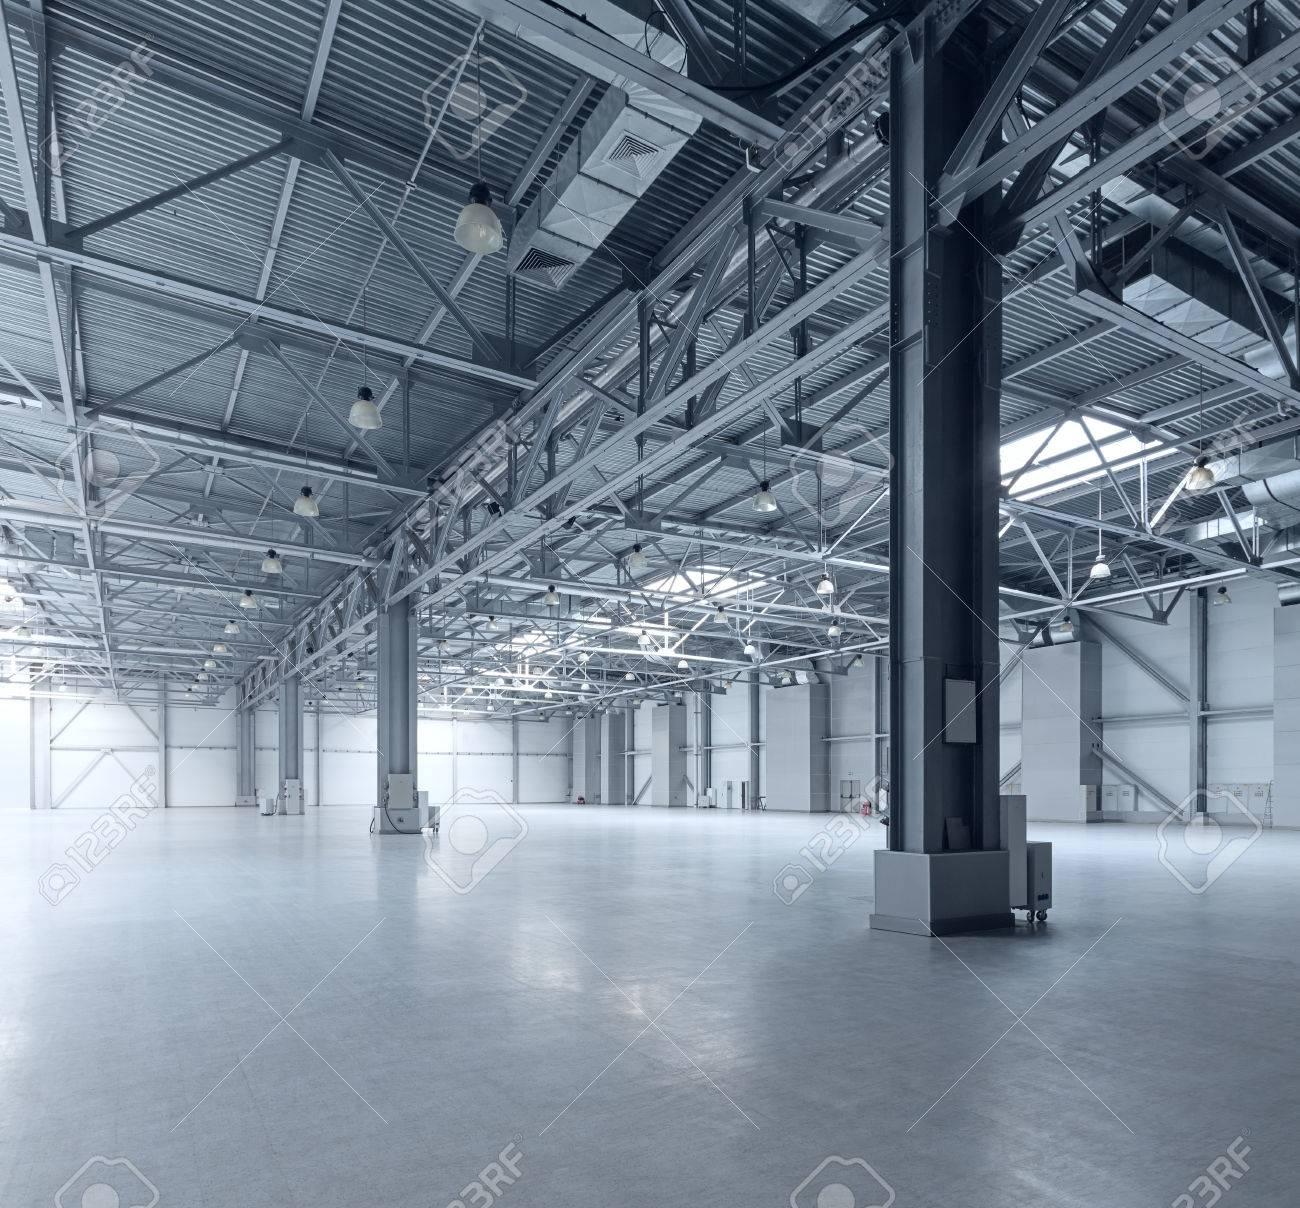 Interior of empty warehouse - 54640348